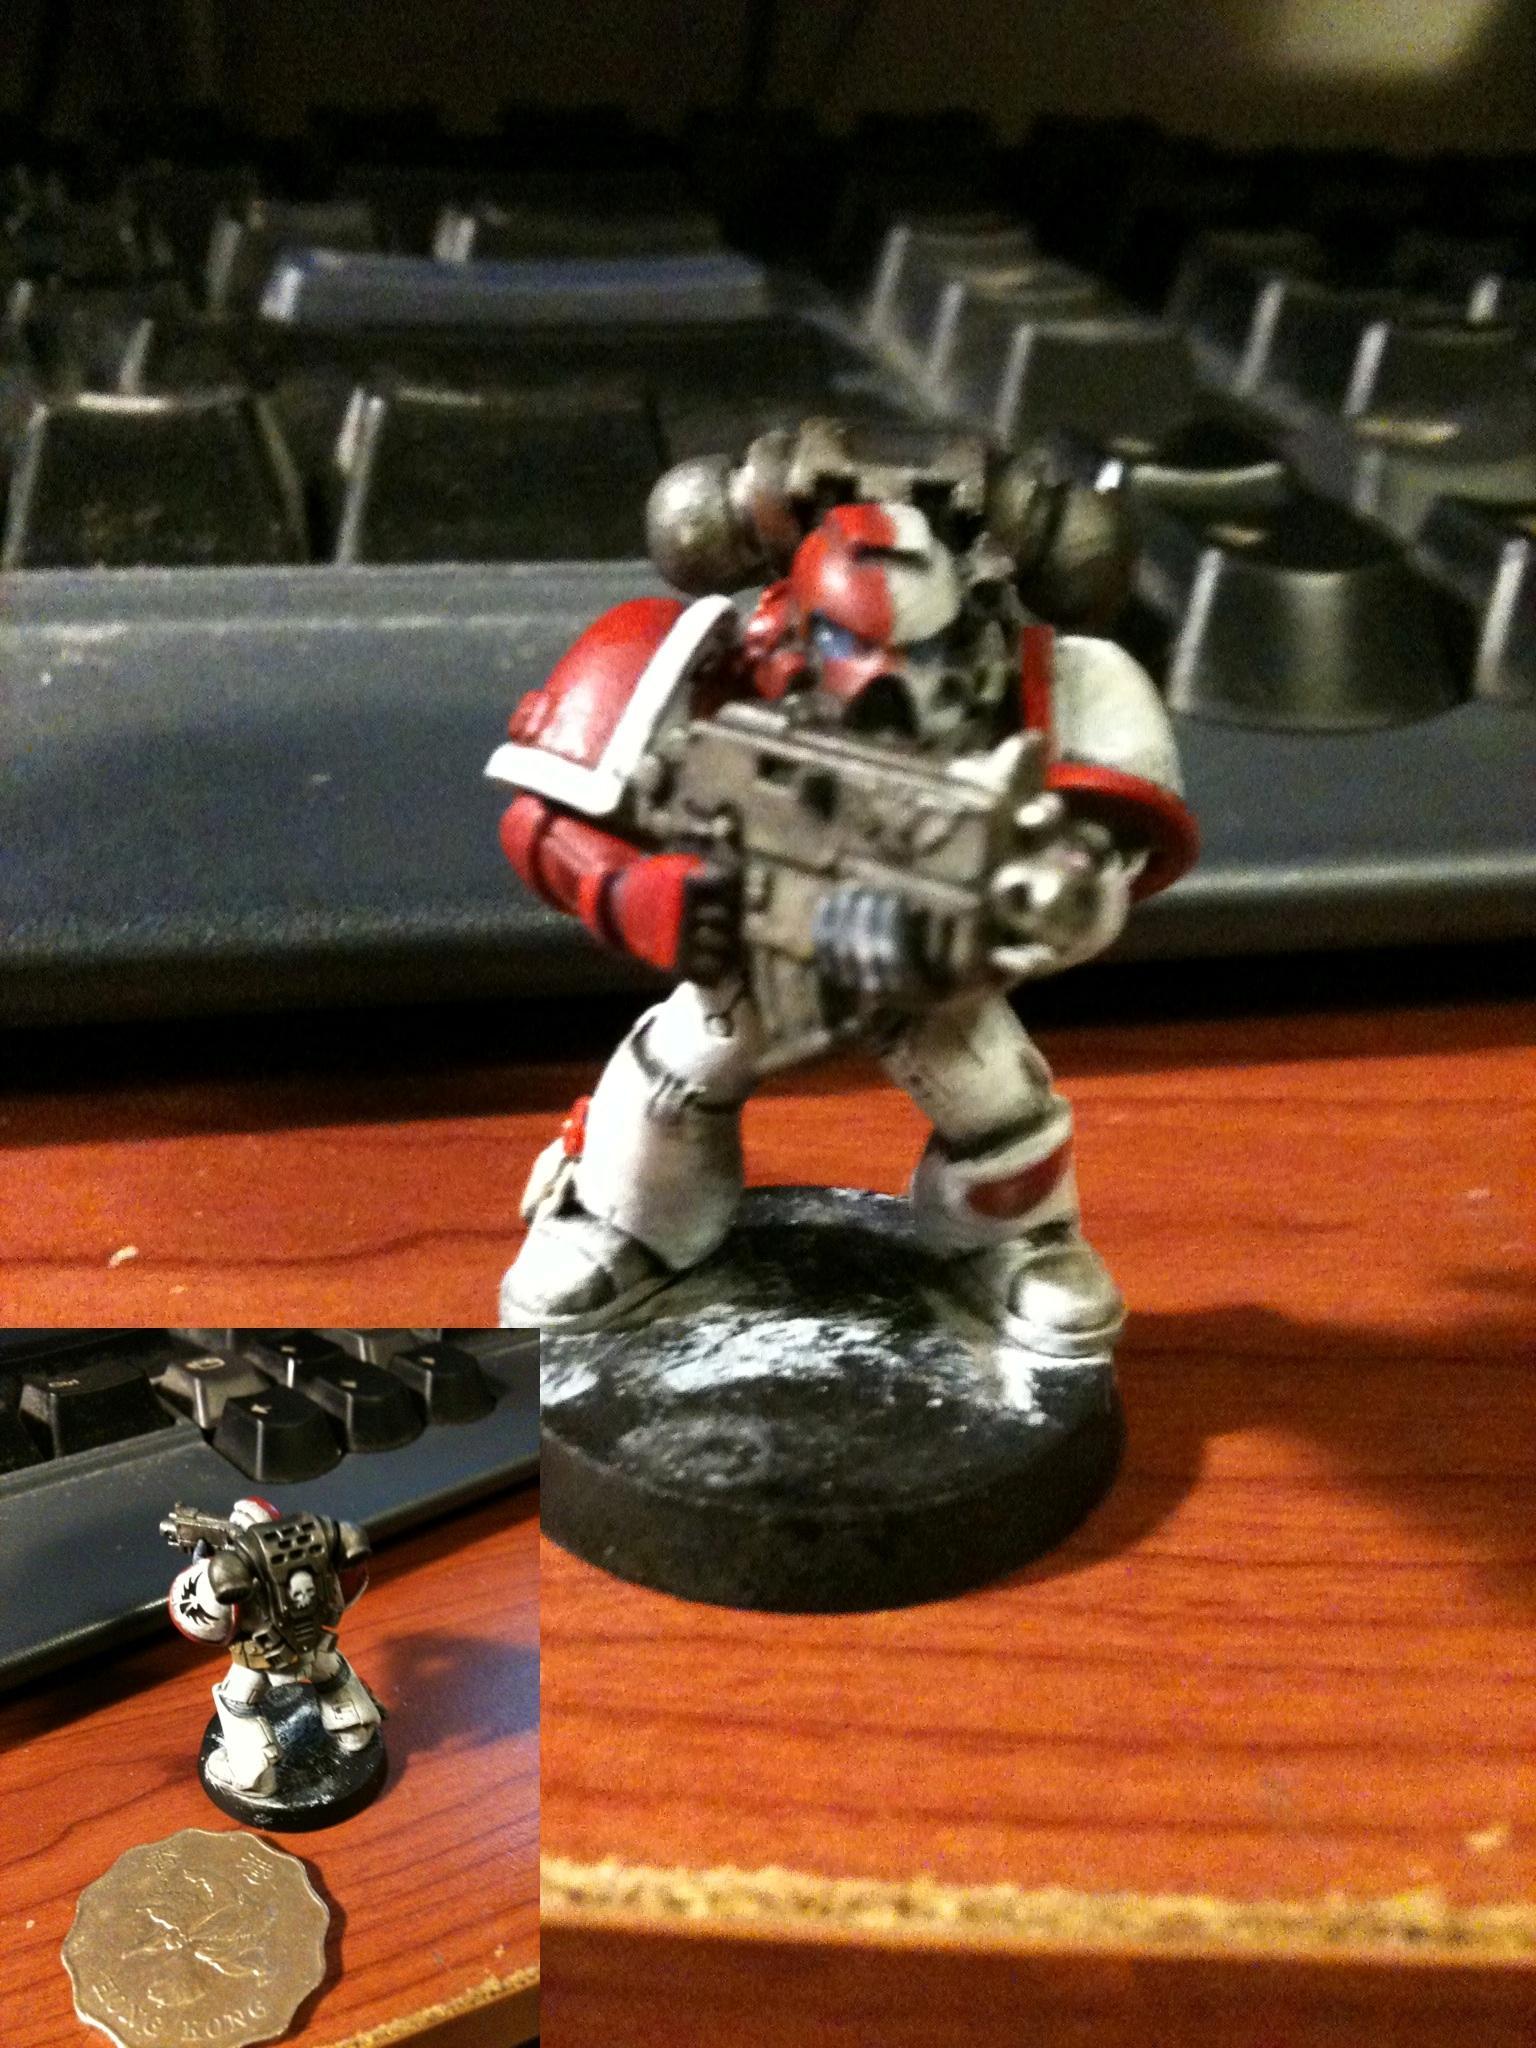 Blood Angels, Boltgun, Do-it-yourself, Infantry, Power Armor, Red, Space Marines, Warhammer 40,000, White, Work In Progress